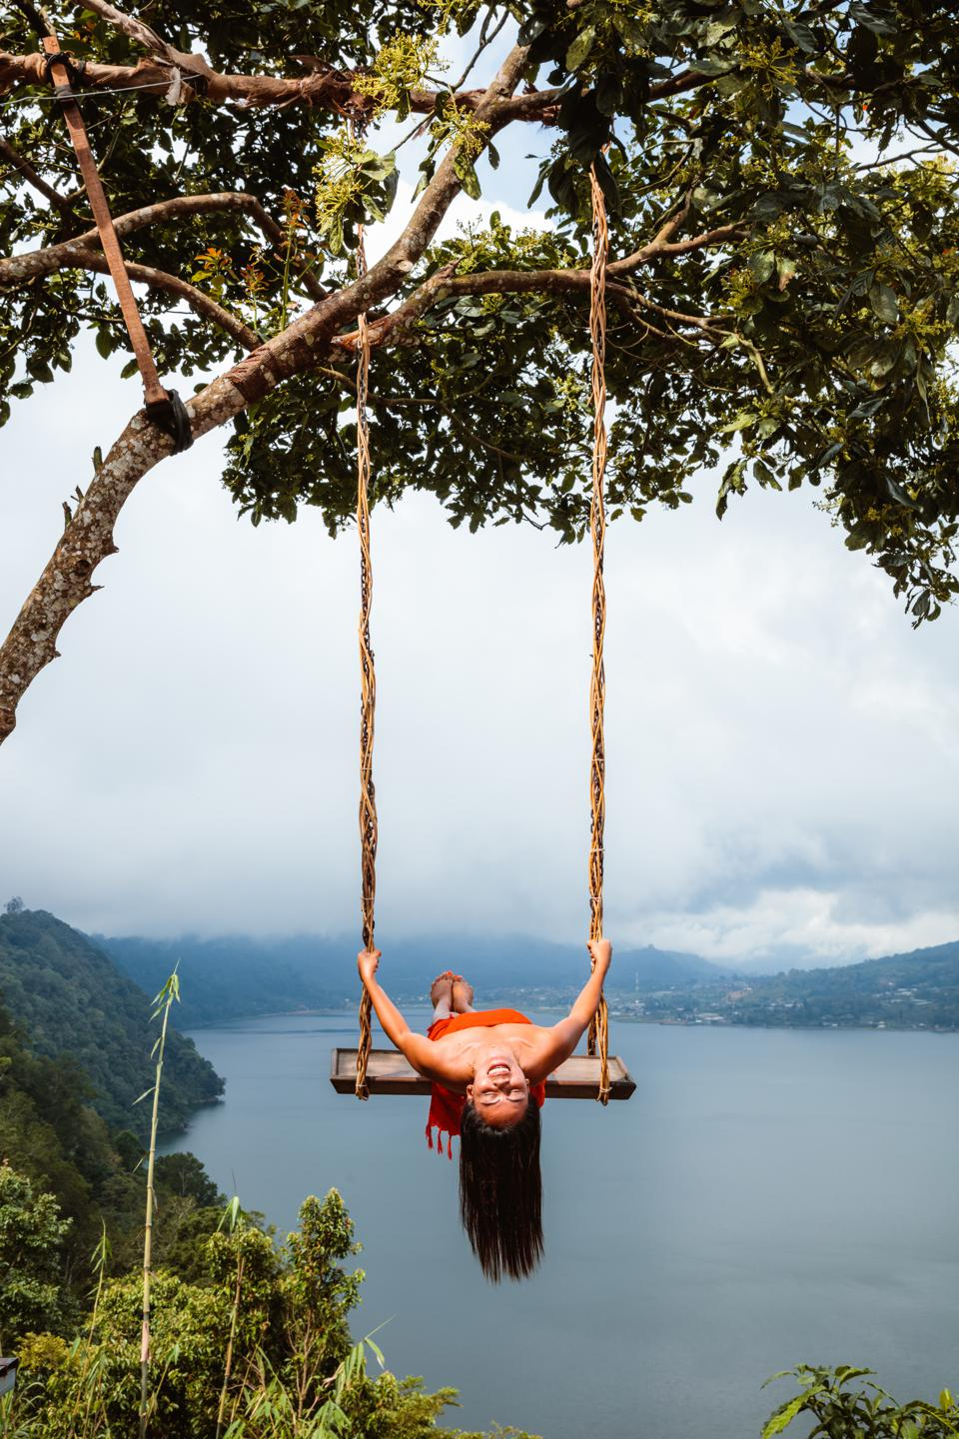 Woman enjoying a ride on a swing, Bali, Indonesia